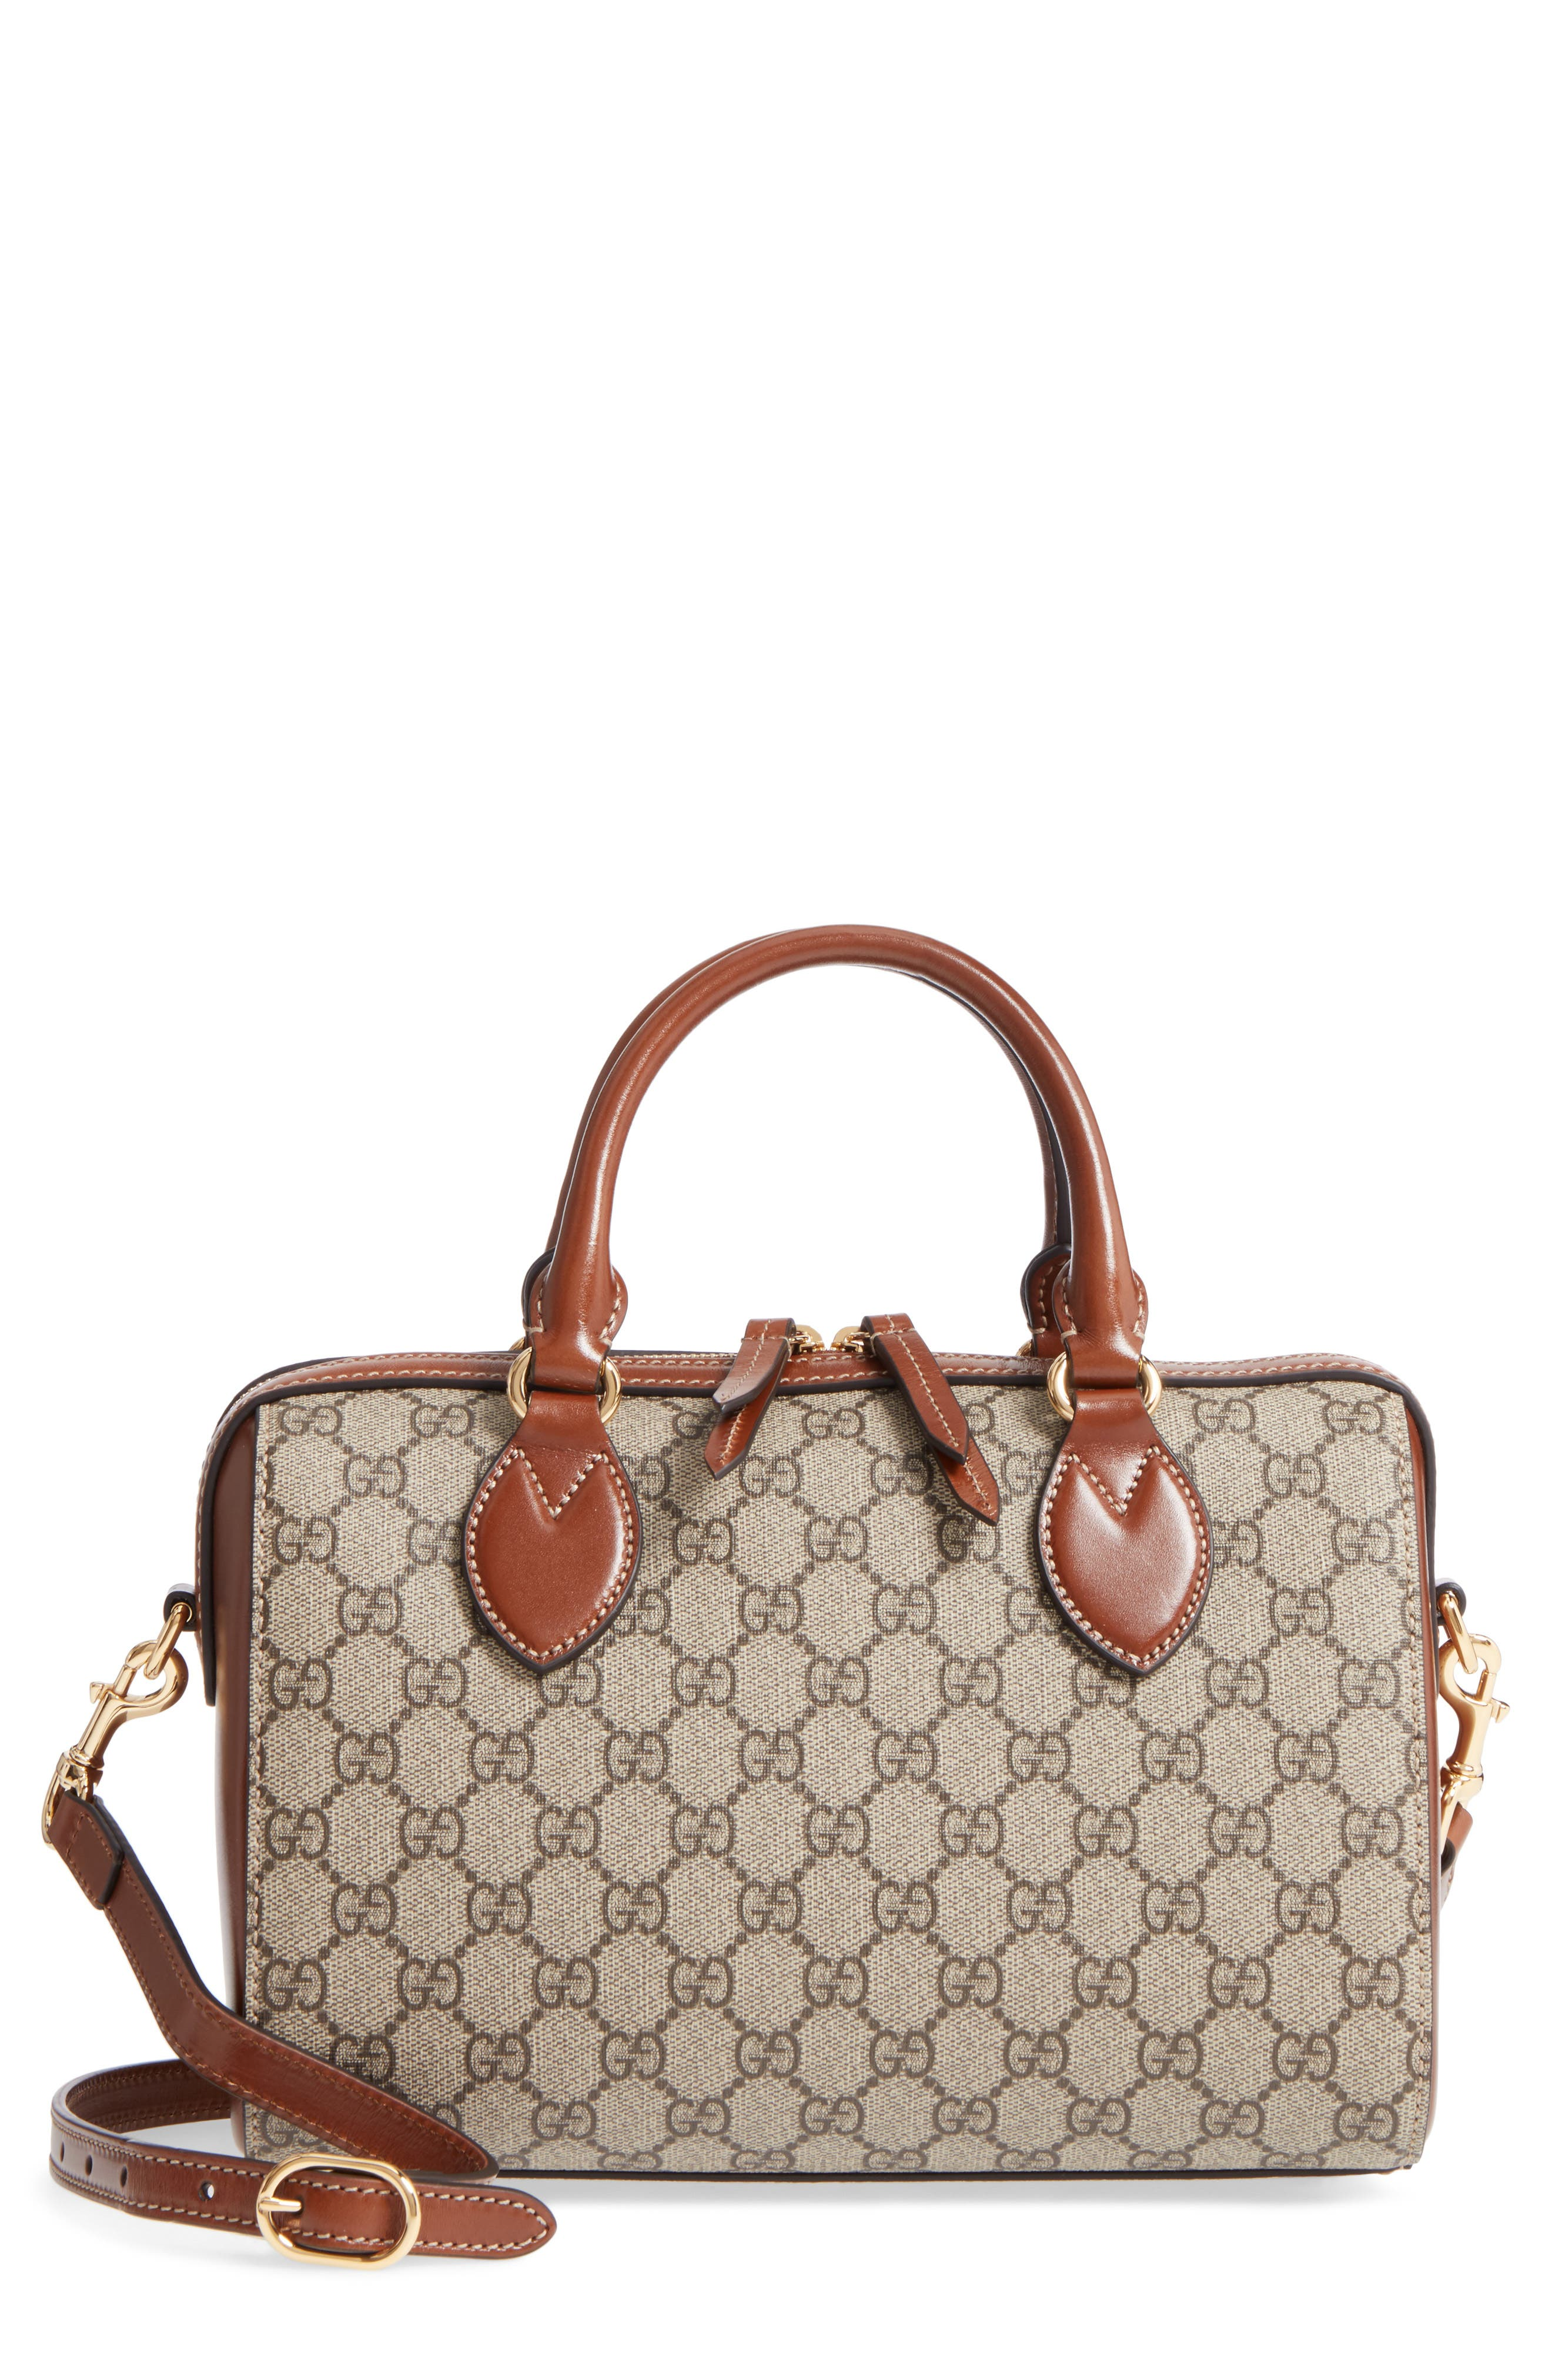 Linea Top Handle GG Supreme Canvas & Leather Bag,                         Main,                         color, Beige/ Ebony/ Cuir